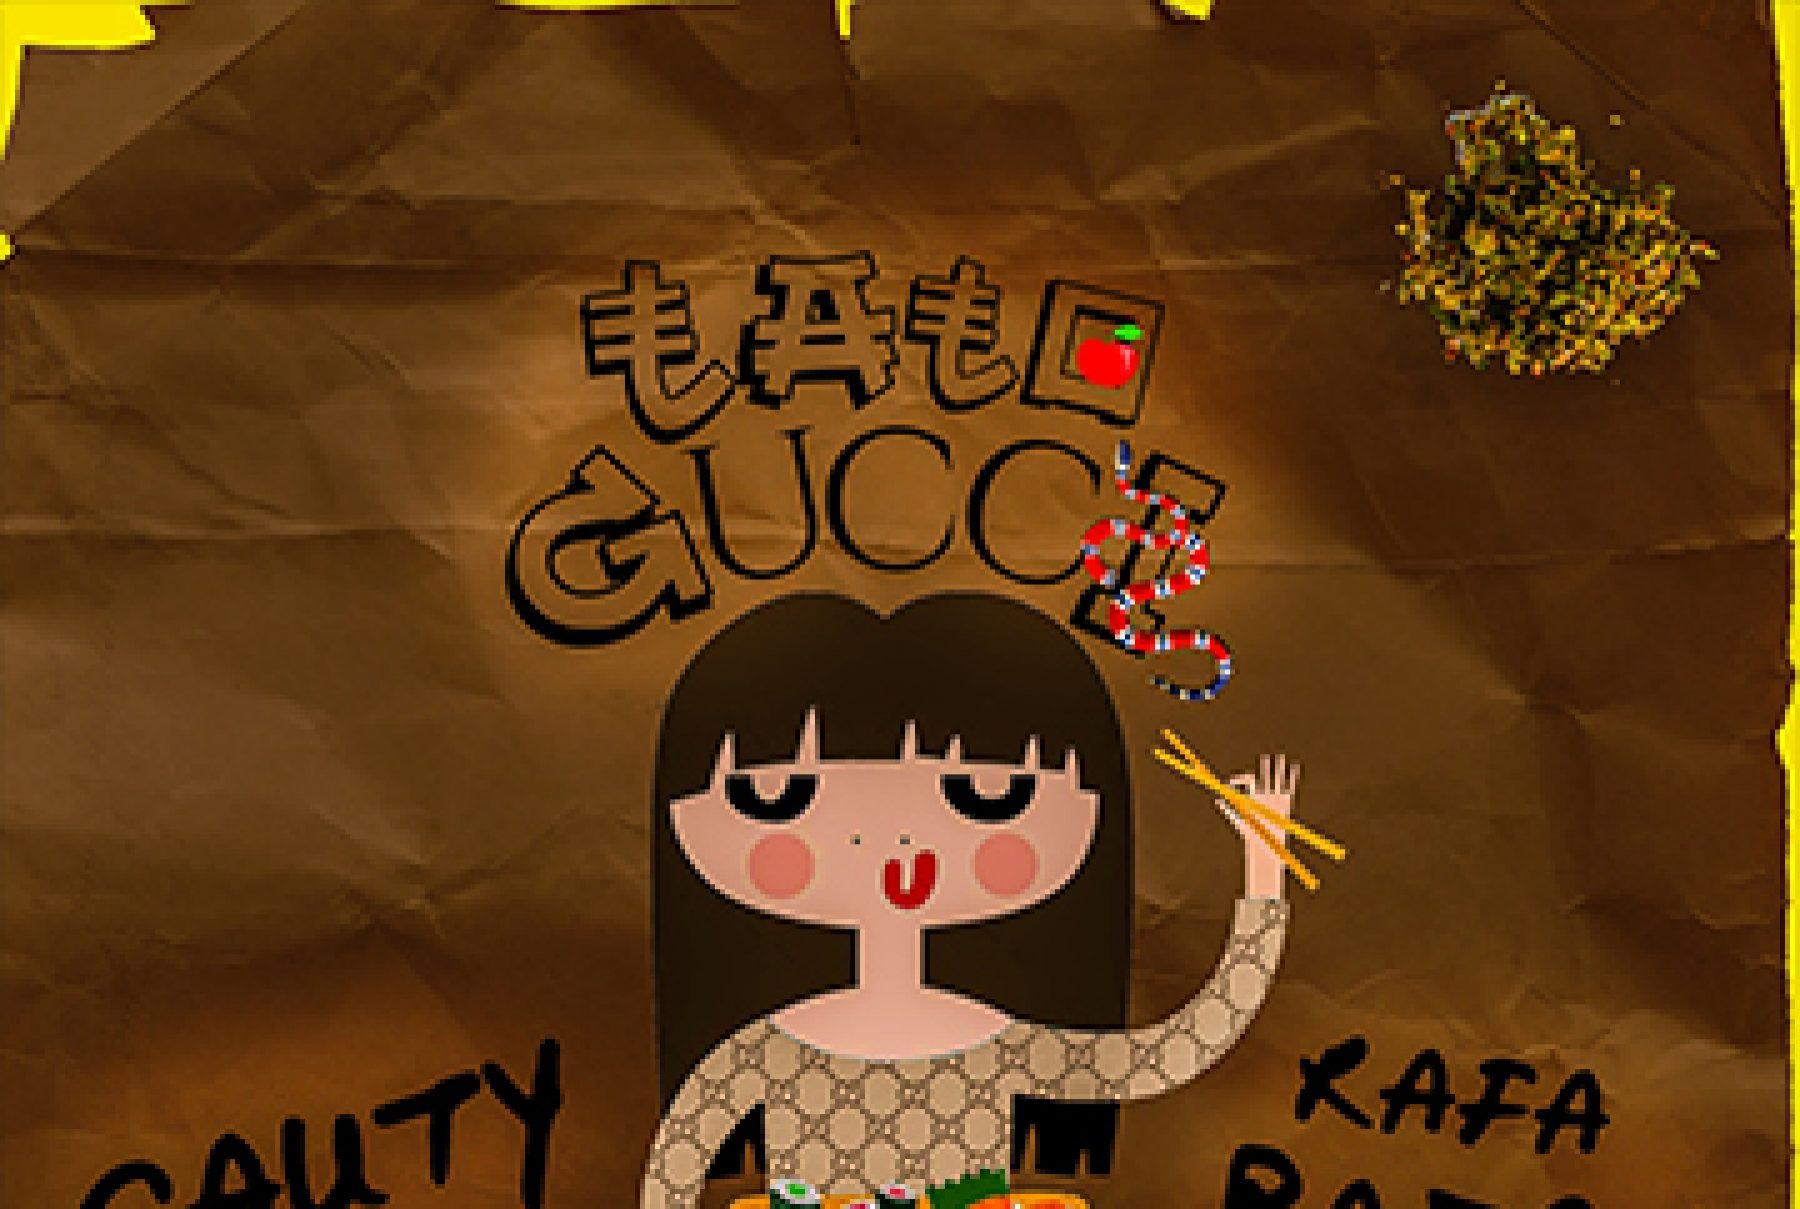 Cauty_TaToGucci_Cover